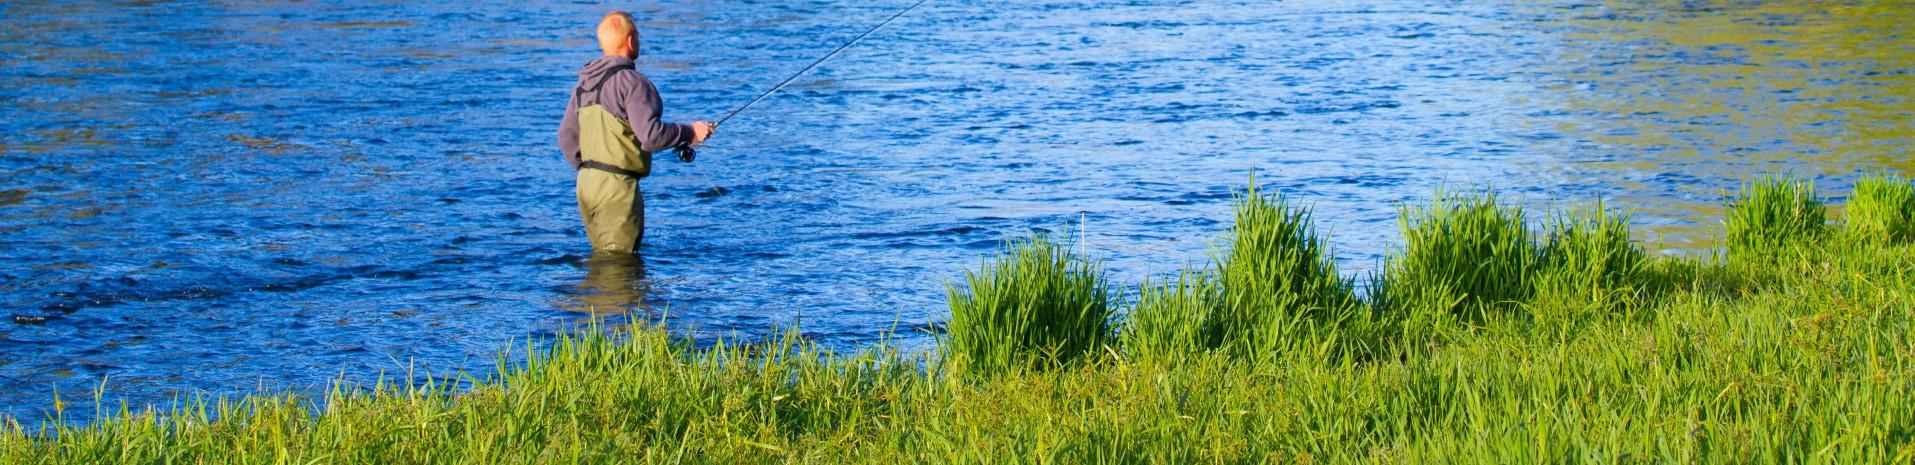 Fishing insurance img